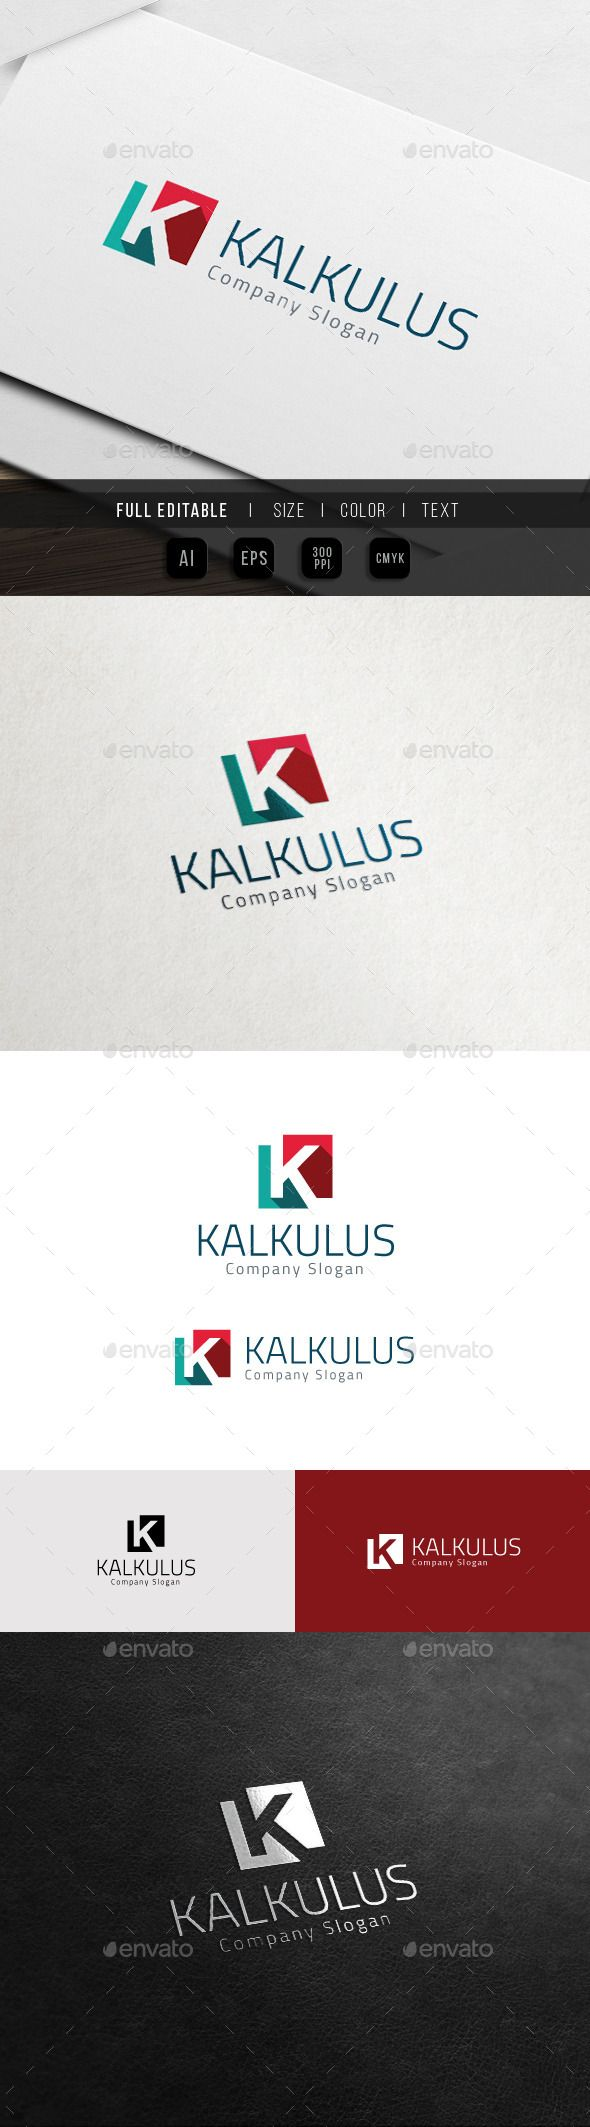 Corporate Brand - Marketing Finance - K Logo | Logos erstellen, Logo ...